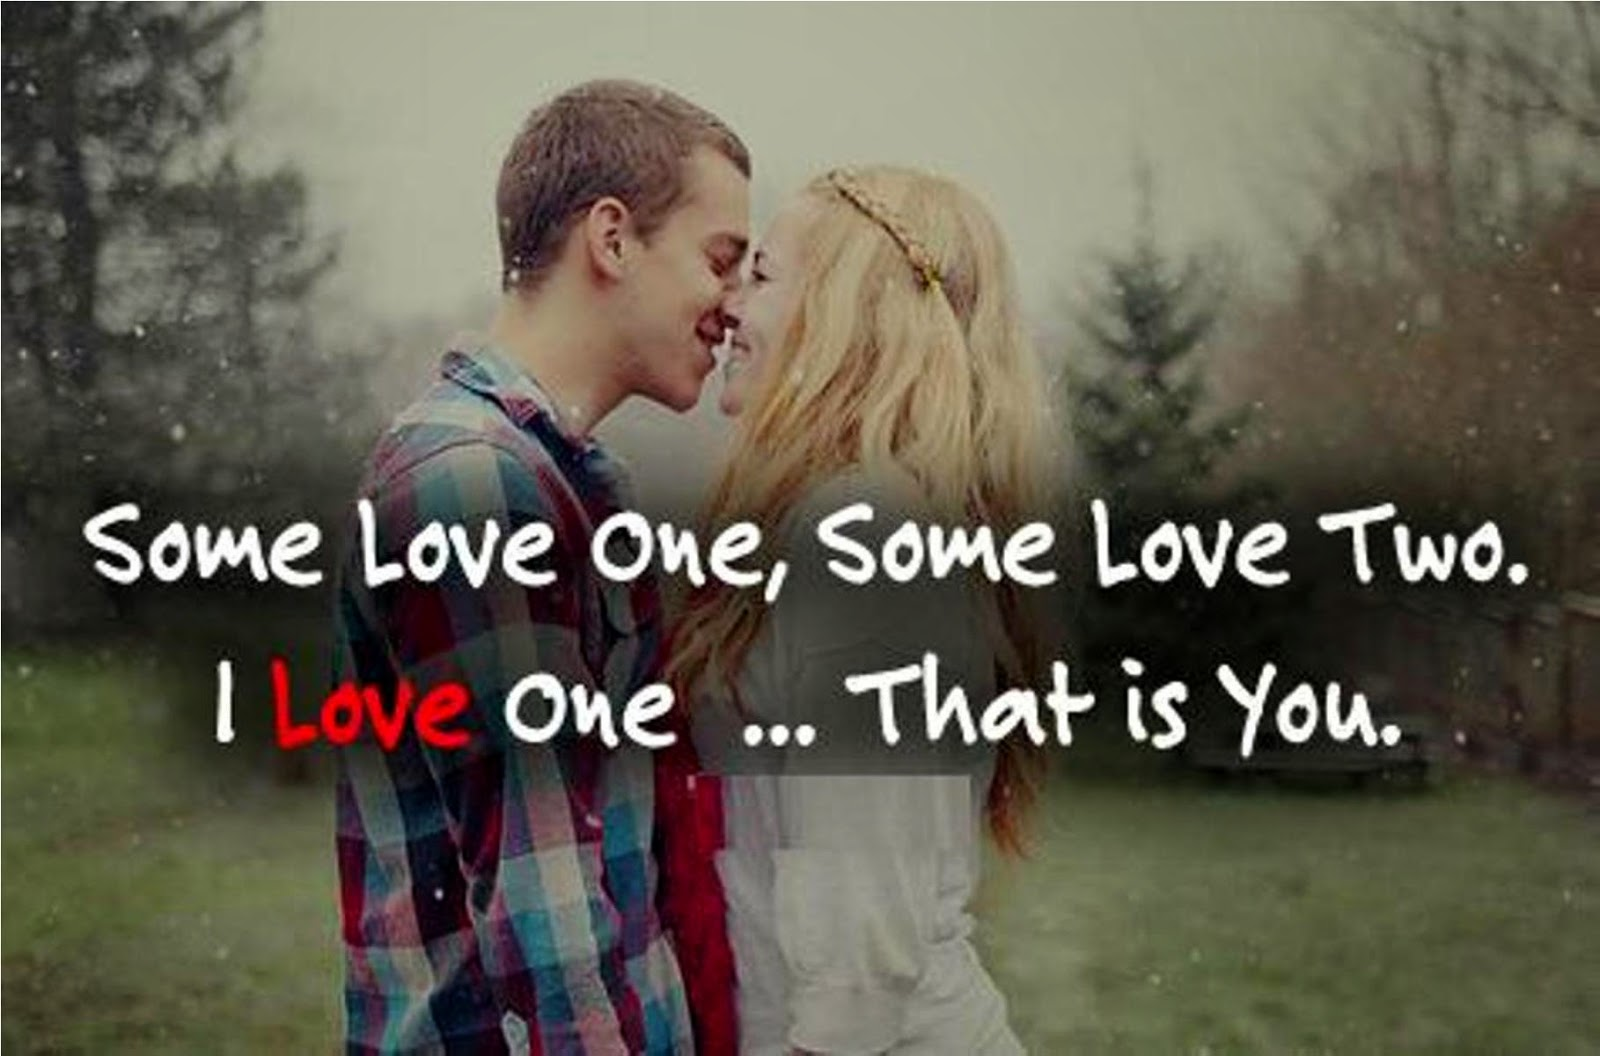 romantic love quotes relationship quotes whatsapp